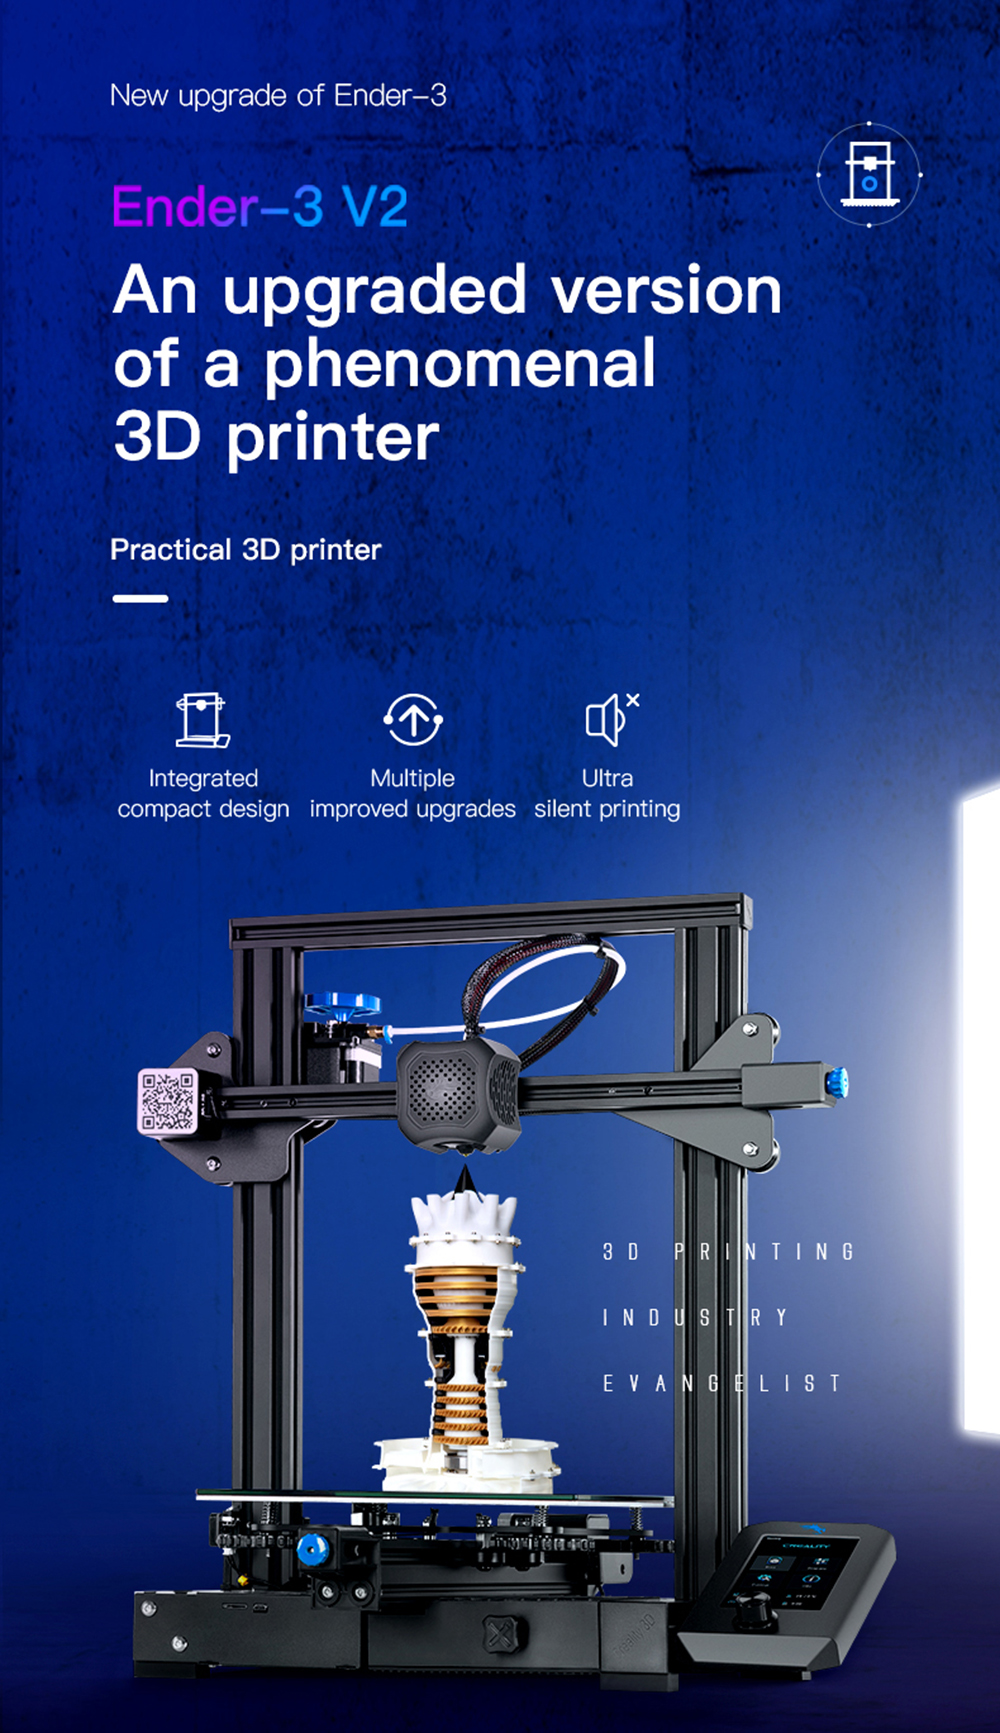 Creality3D Ender 3 V2 3D-Drucker Bausatz - 220x220x250mm - Verbesserte Version des Ender 3